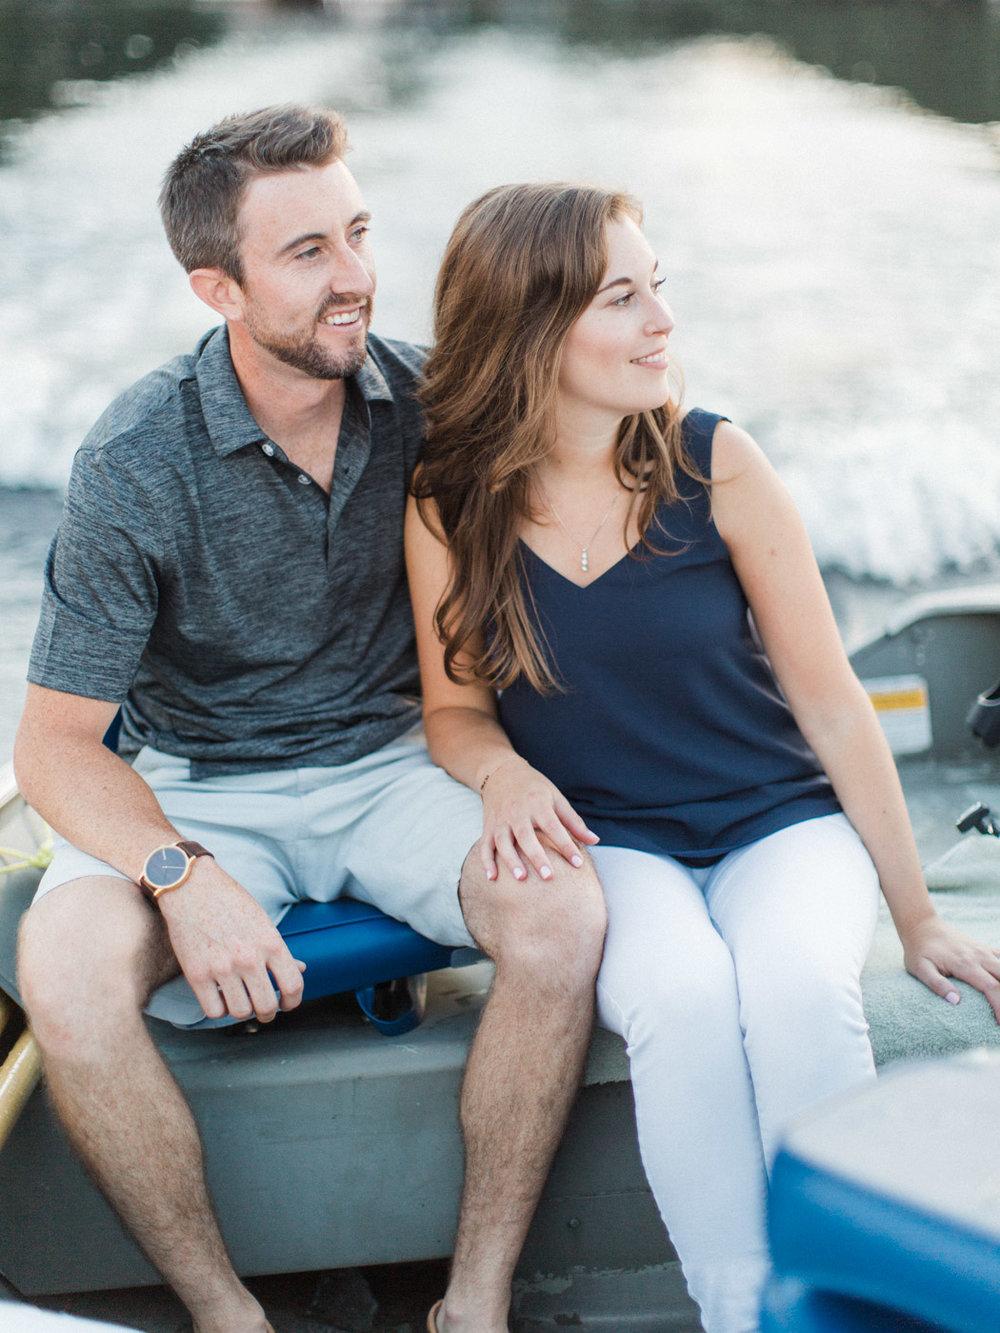 muskoka-wedding-photographer-adventurous-couples-engagement-session-lake-81.jpg